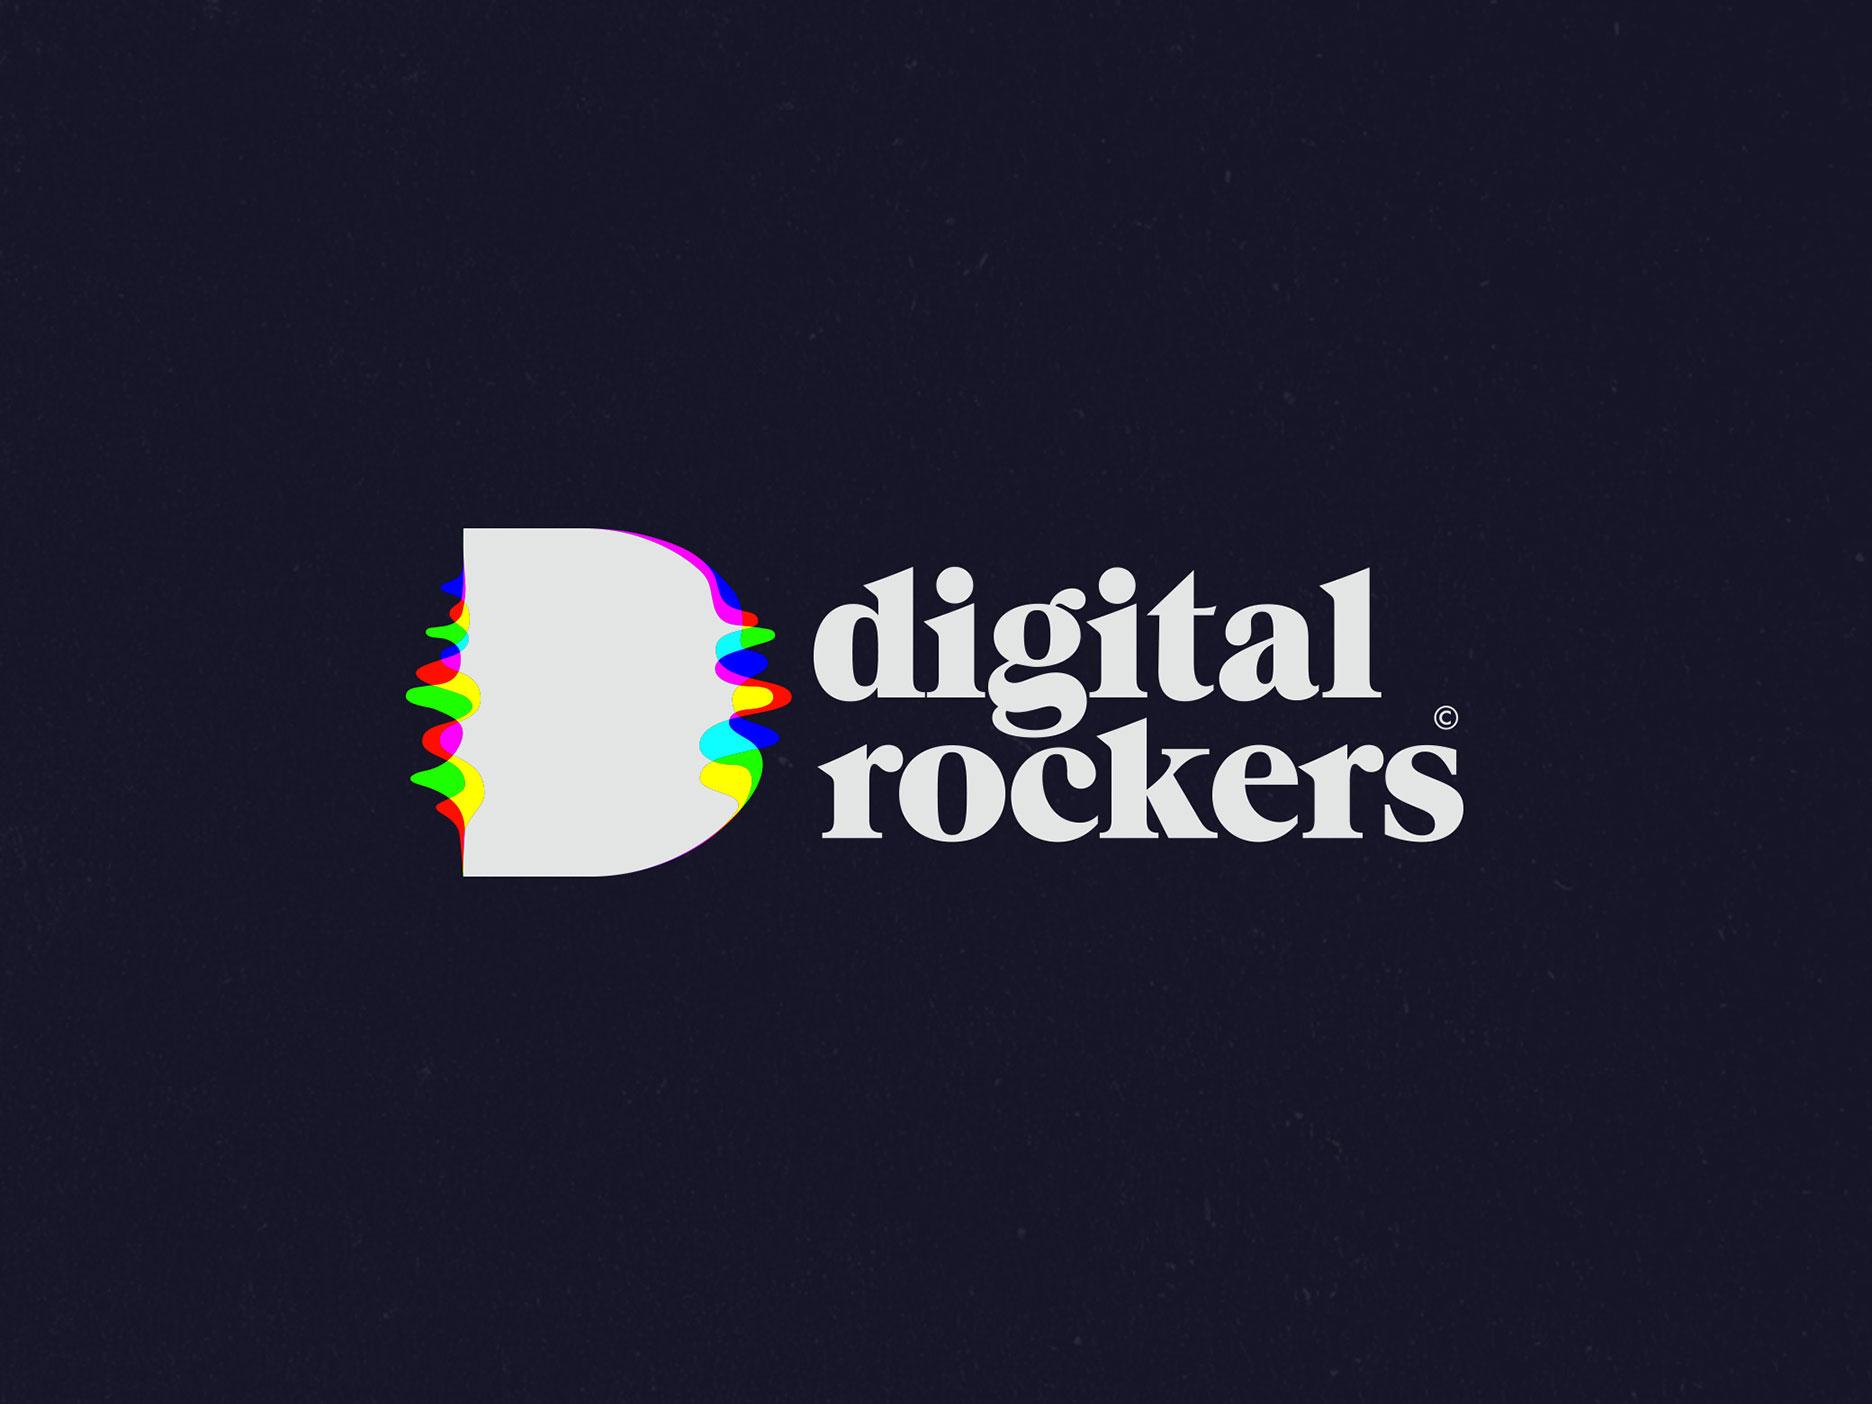 Digital Rockers - logo